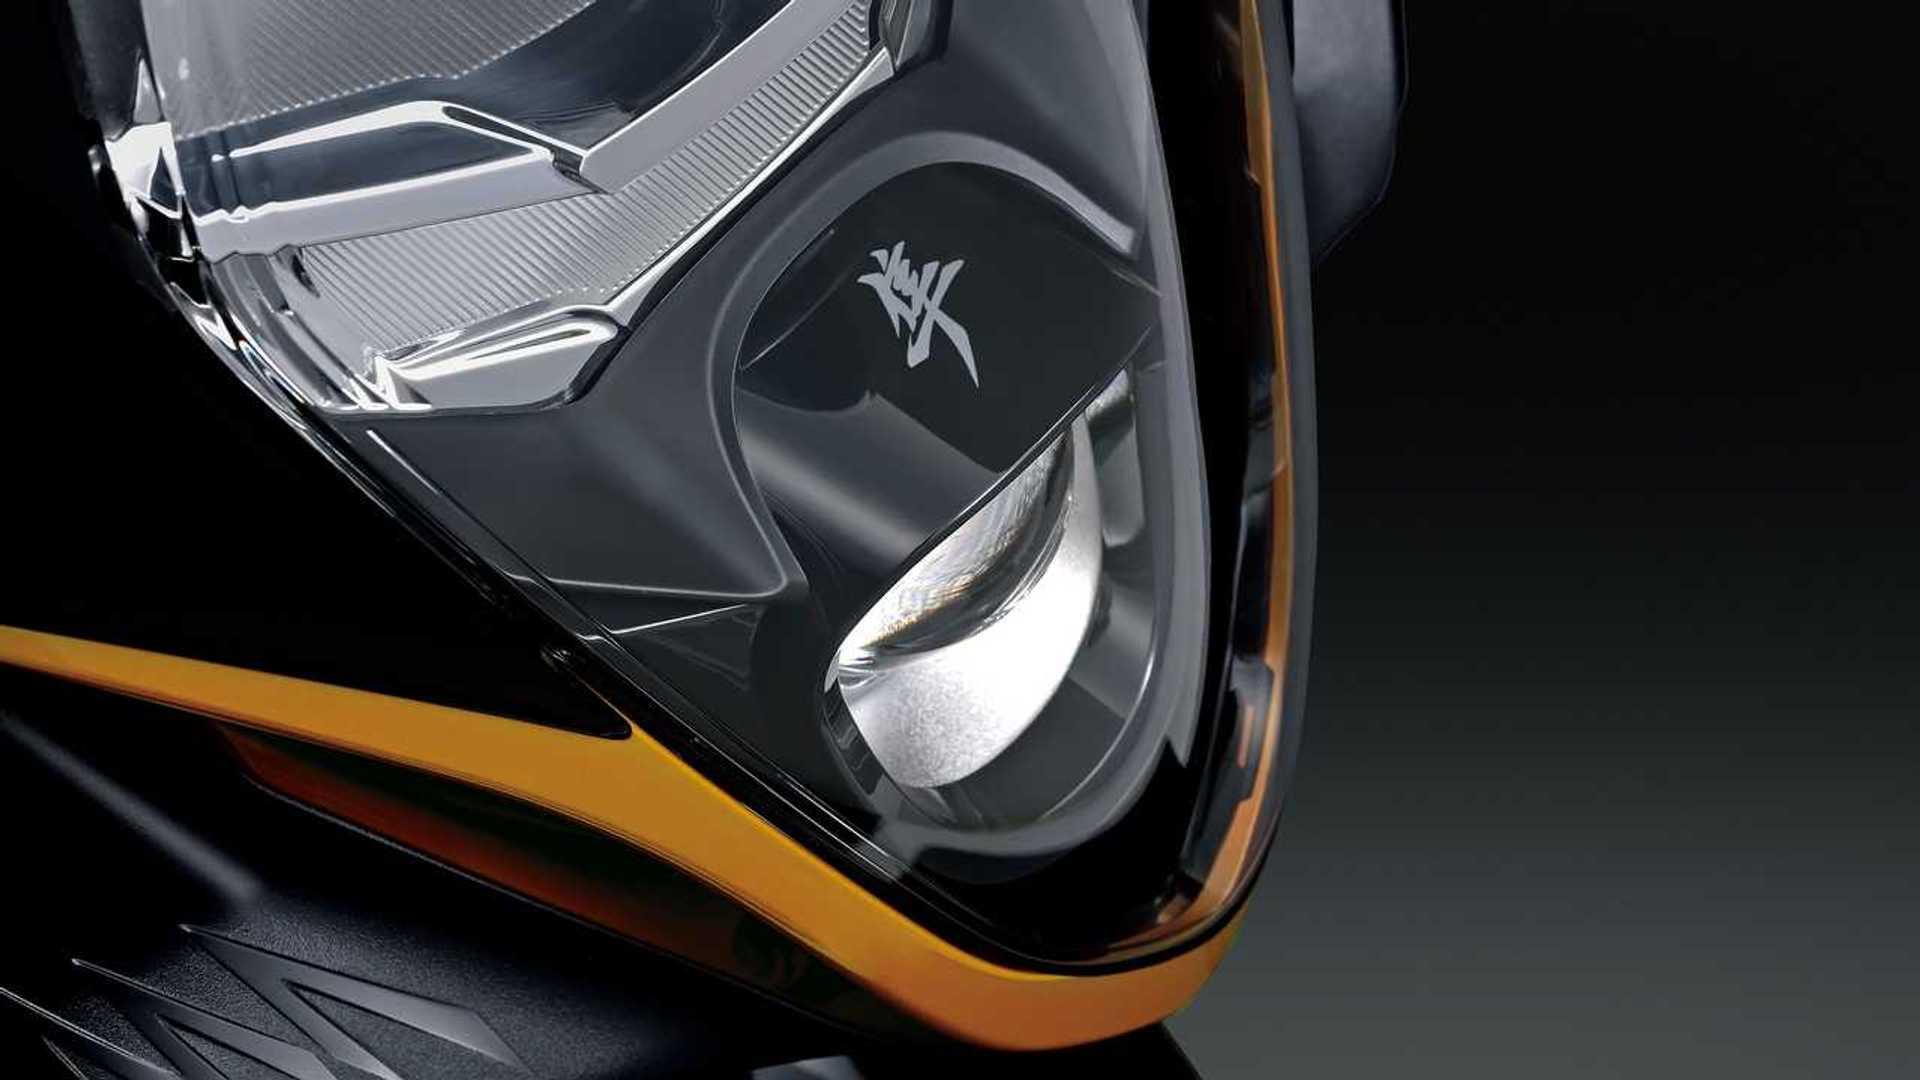 2022 Suzuki Hayabusa Headlight Detail